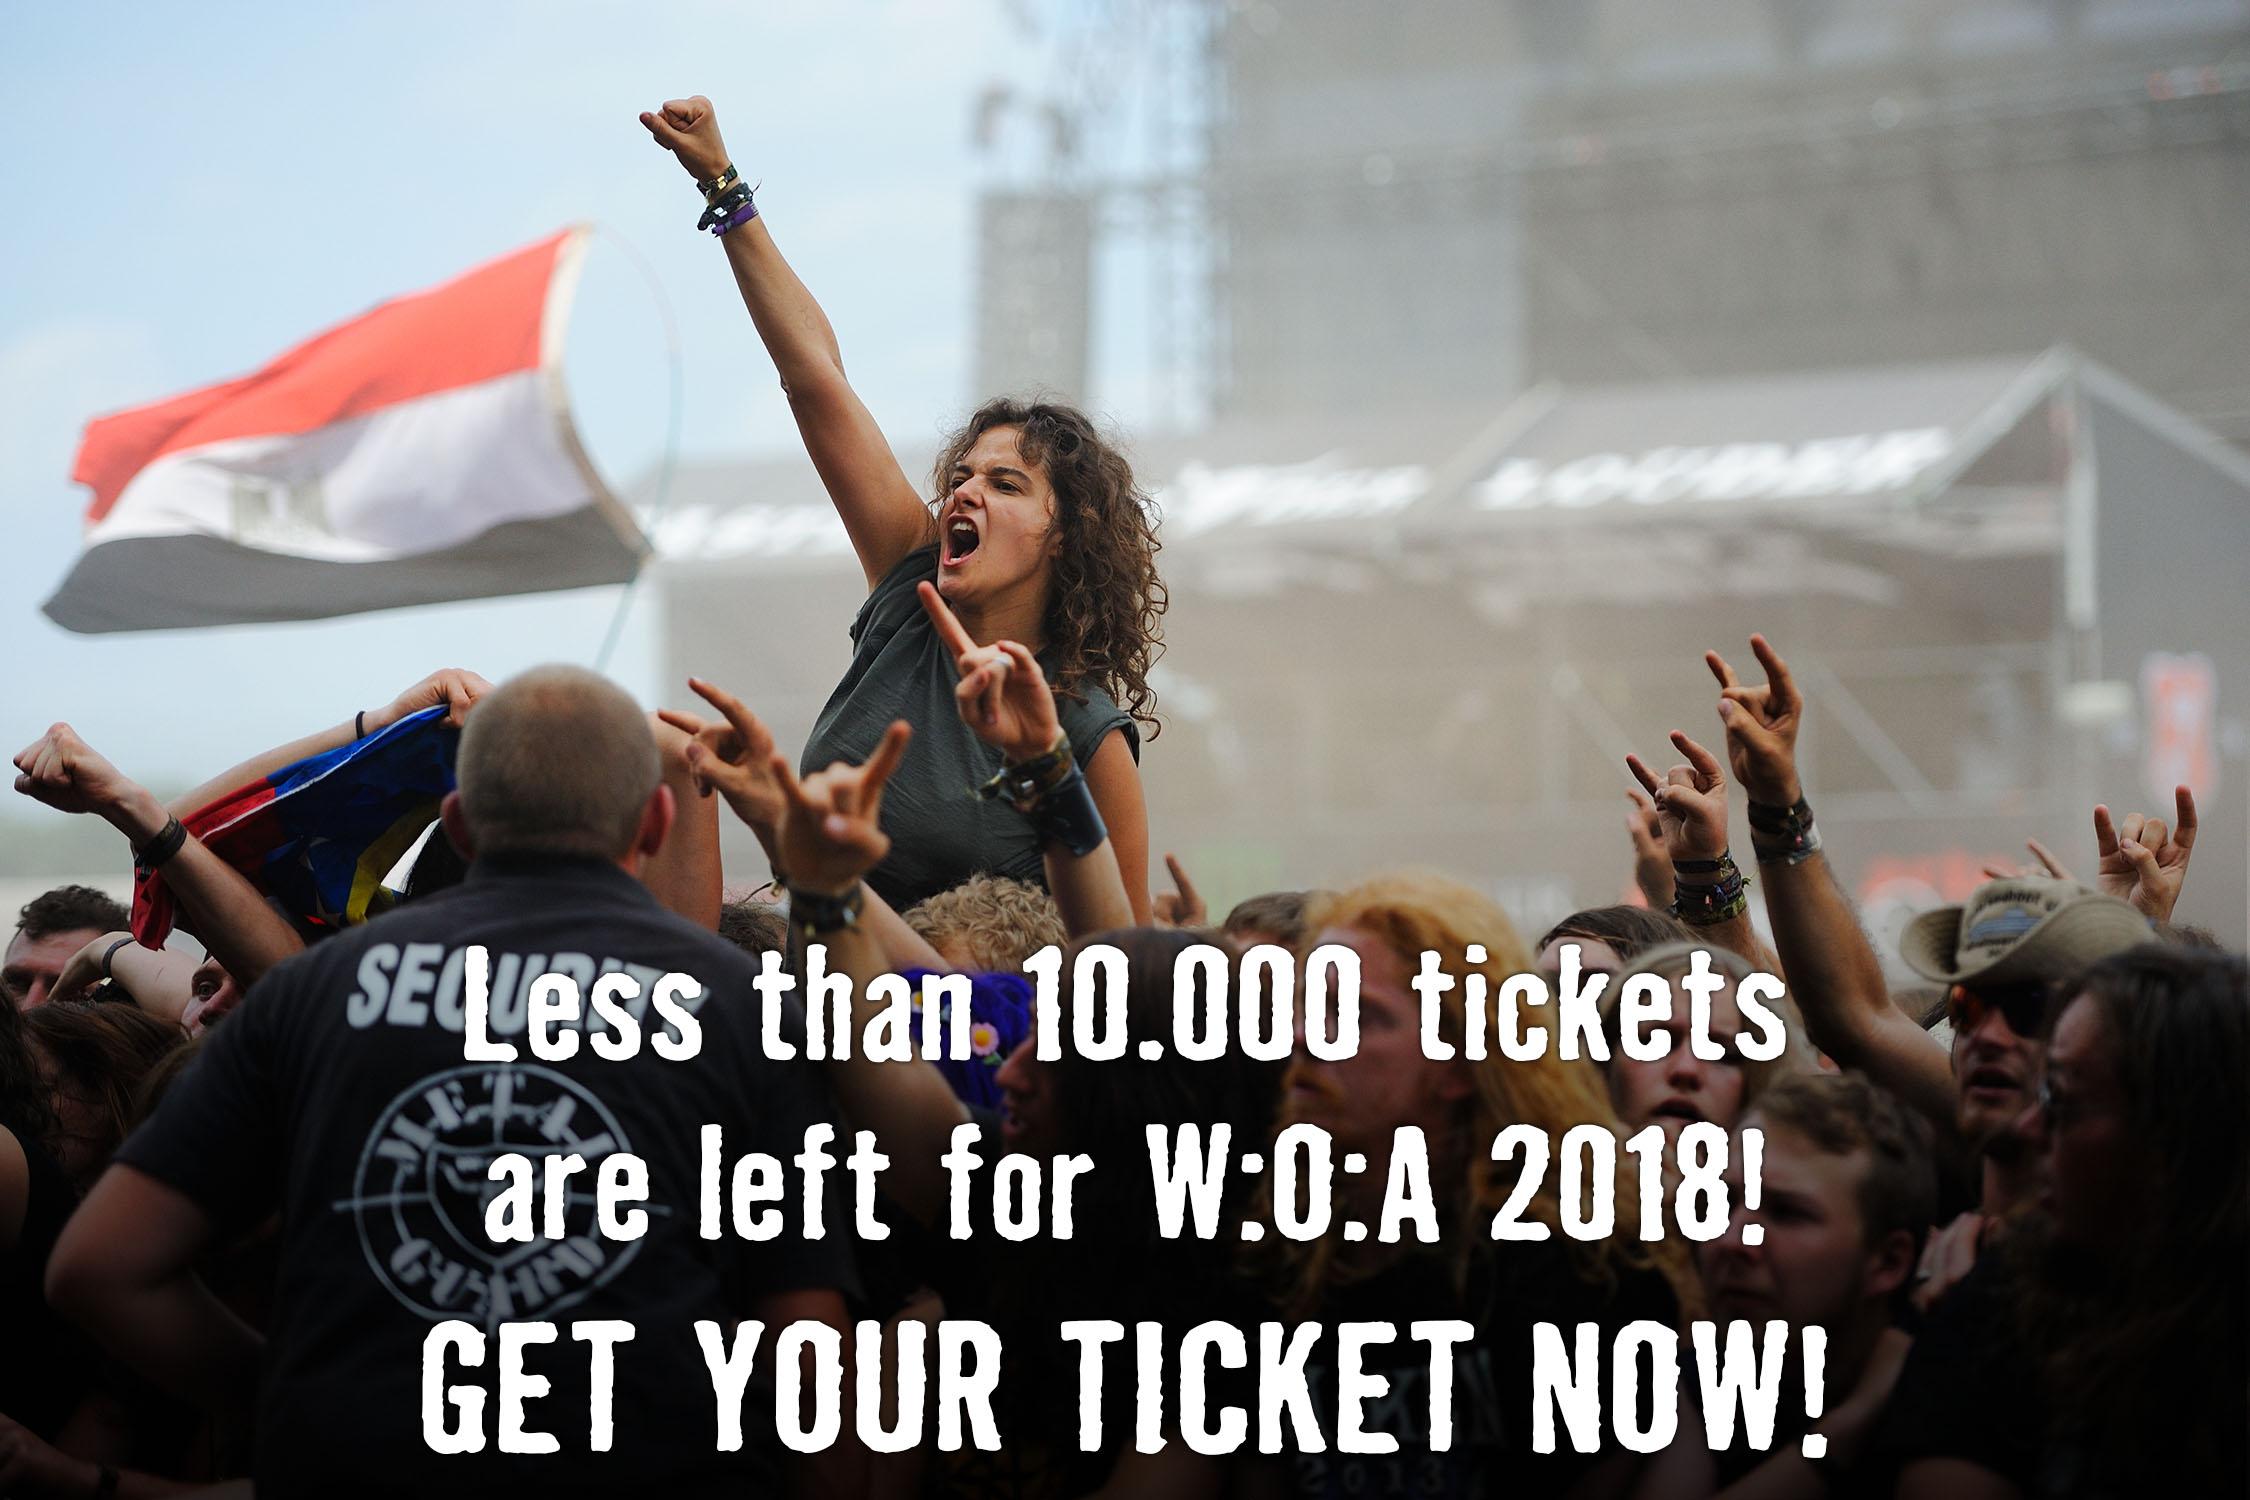 WOA 2018 FB Banner 10K tickets